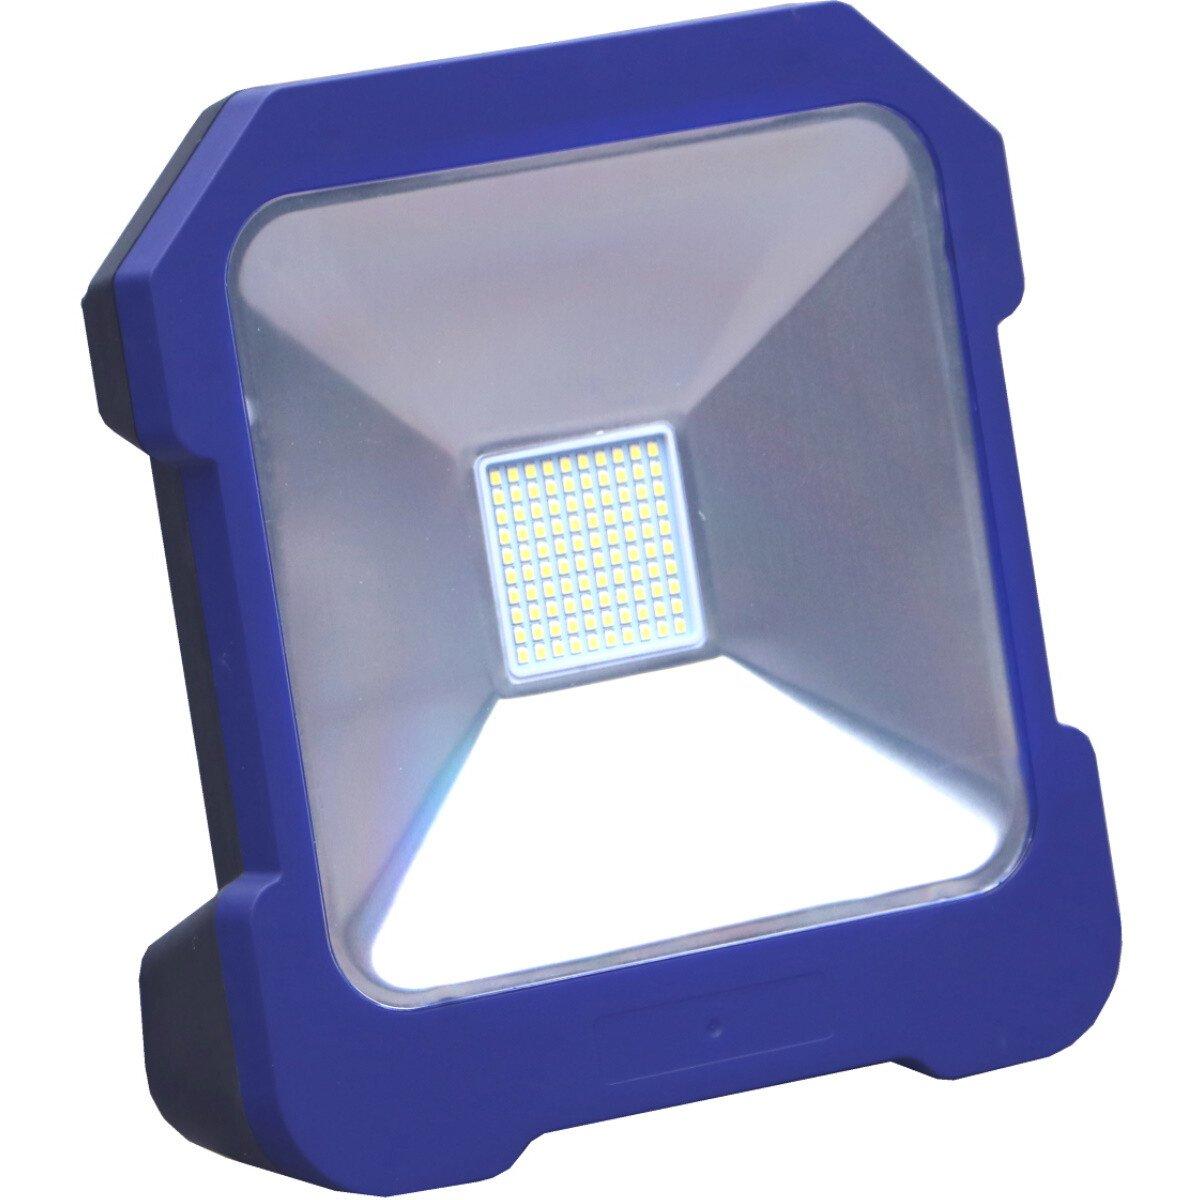 Spectre SP-17180 230V 20W SMD LED Tasklight